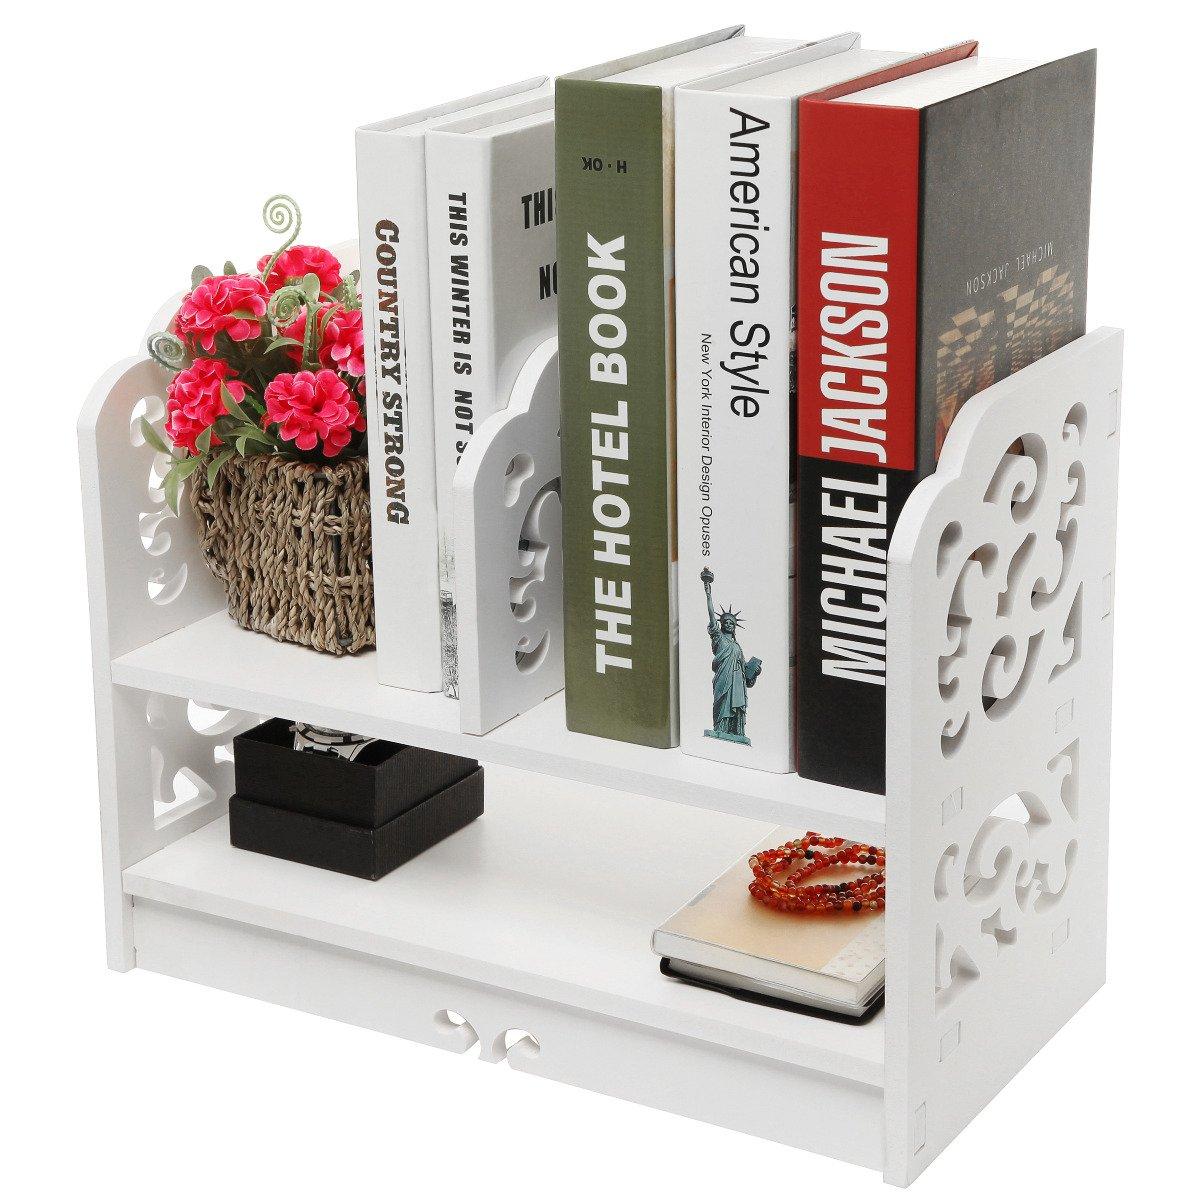 MyGift White Openwork Freestanding Book Shelf/Desk Top Organization Caddy/Stationary Storage AX-AY-ABHI-94840